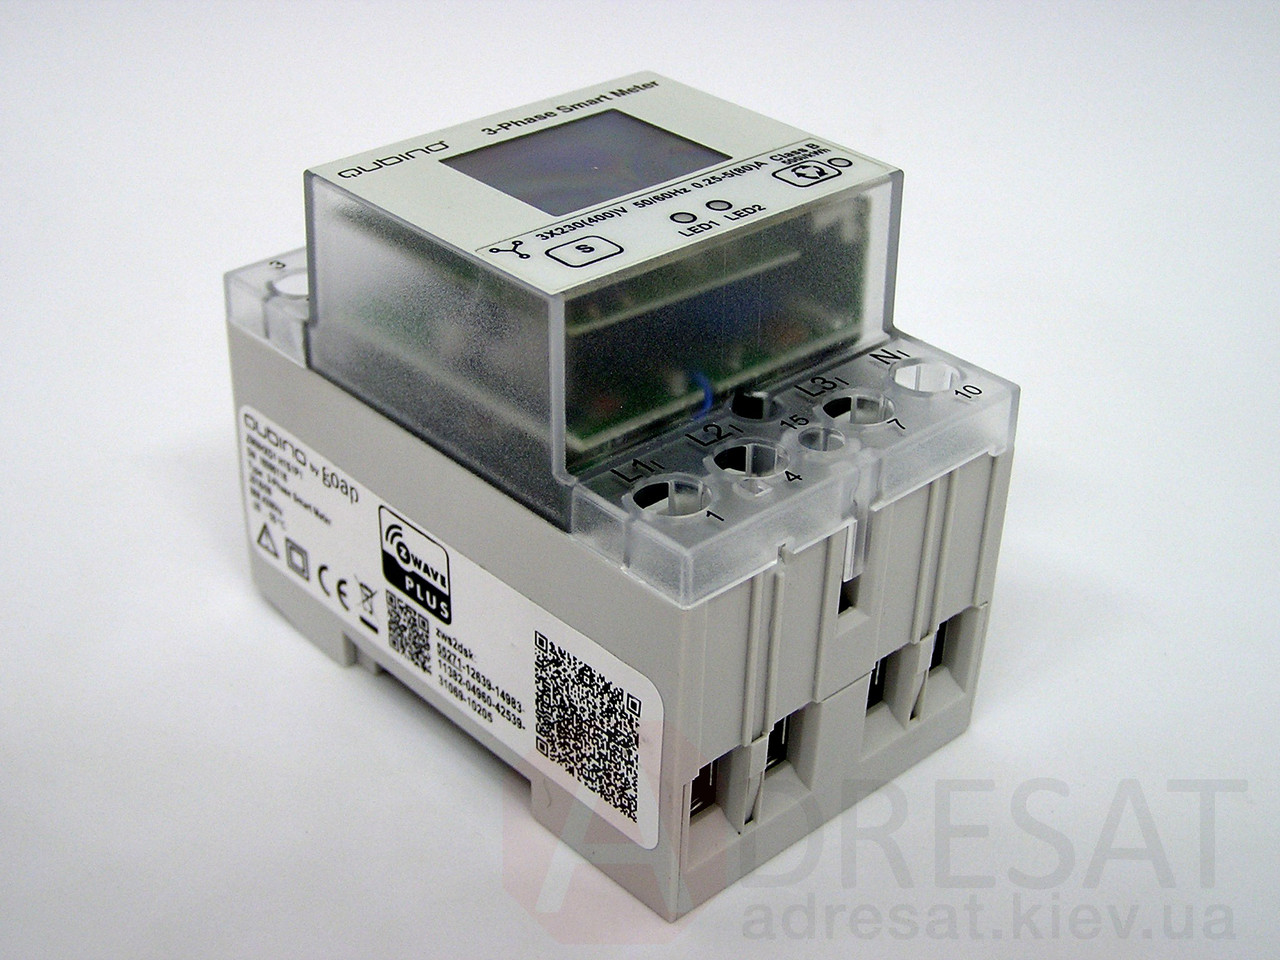 ZMNHXD1,Qubino 3-Phase Smart Meter, Z-Wave вимірювач енергоспоживання